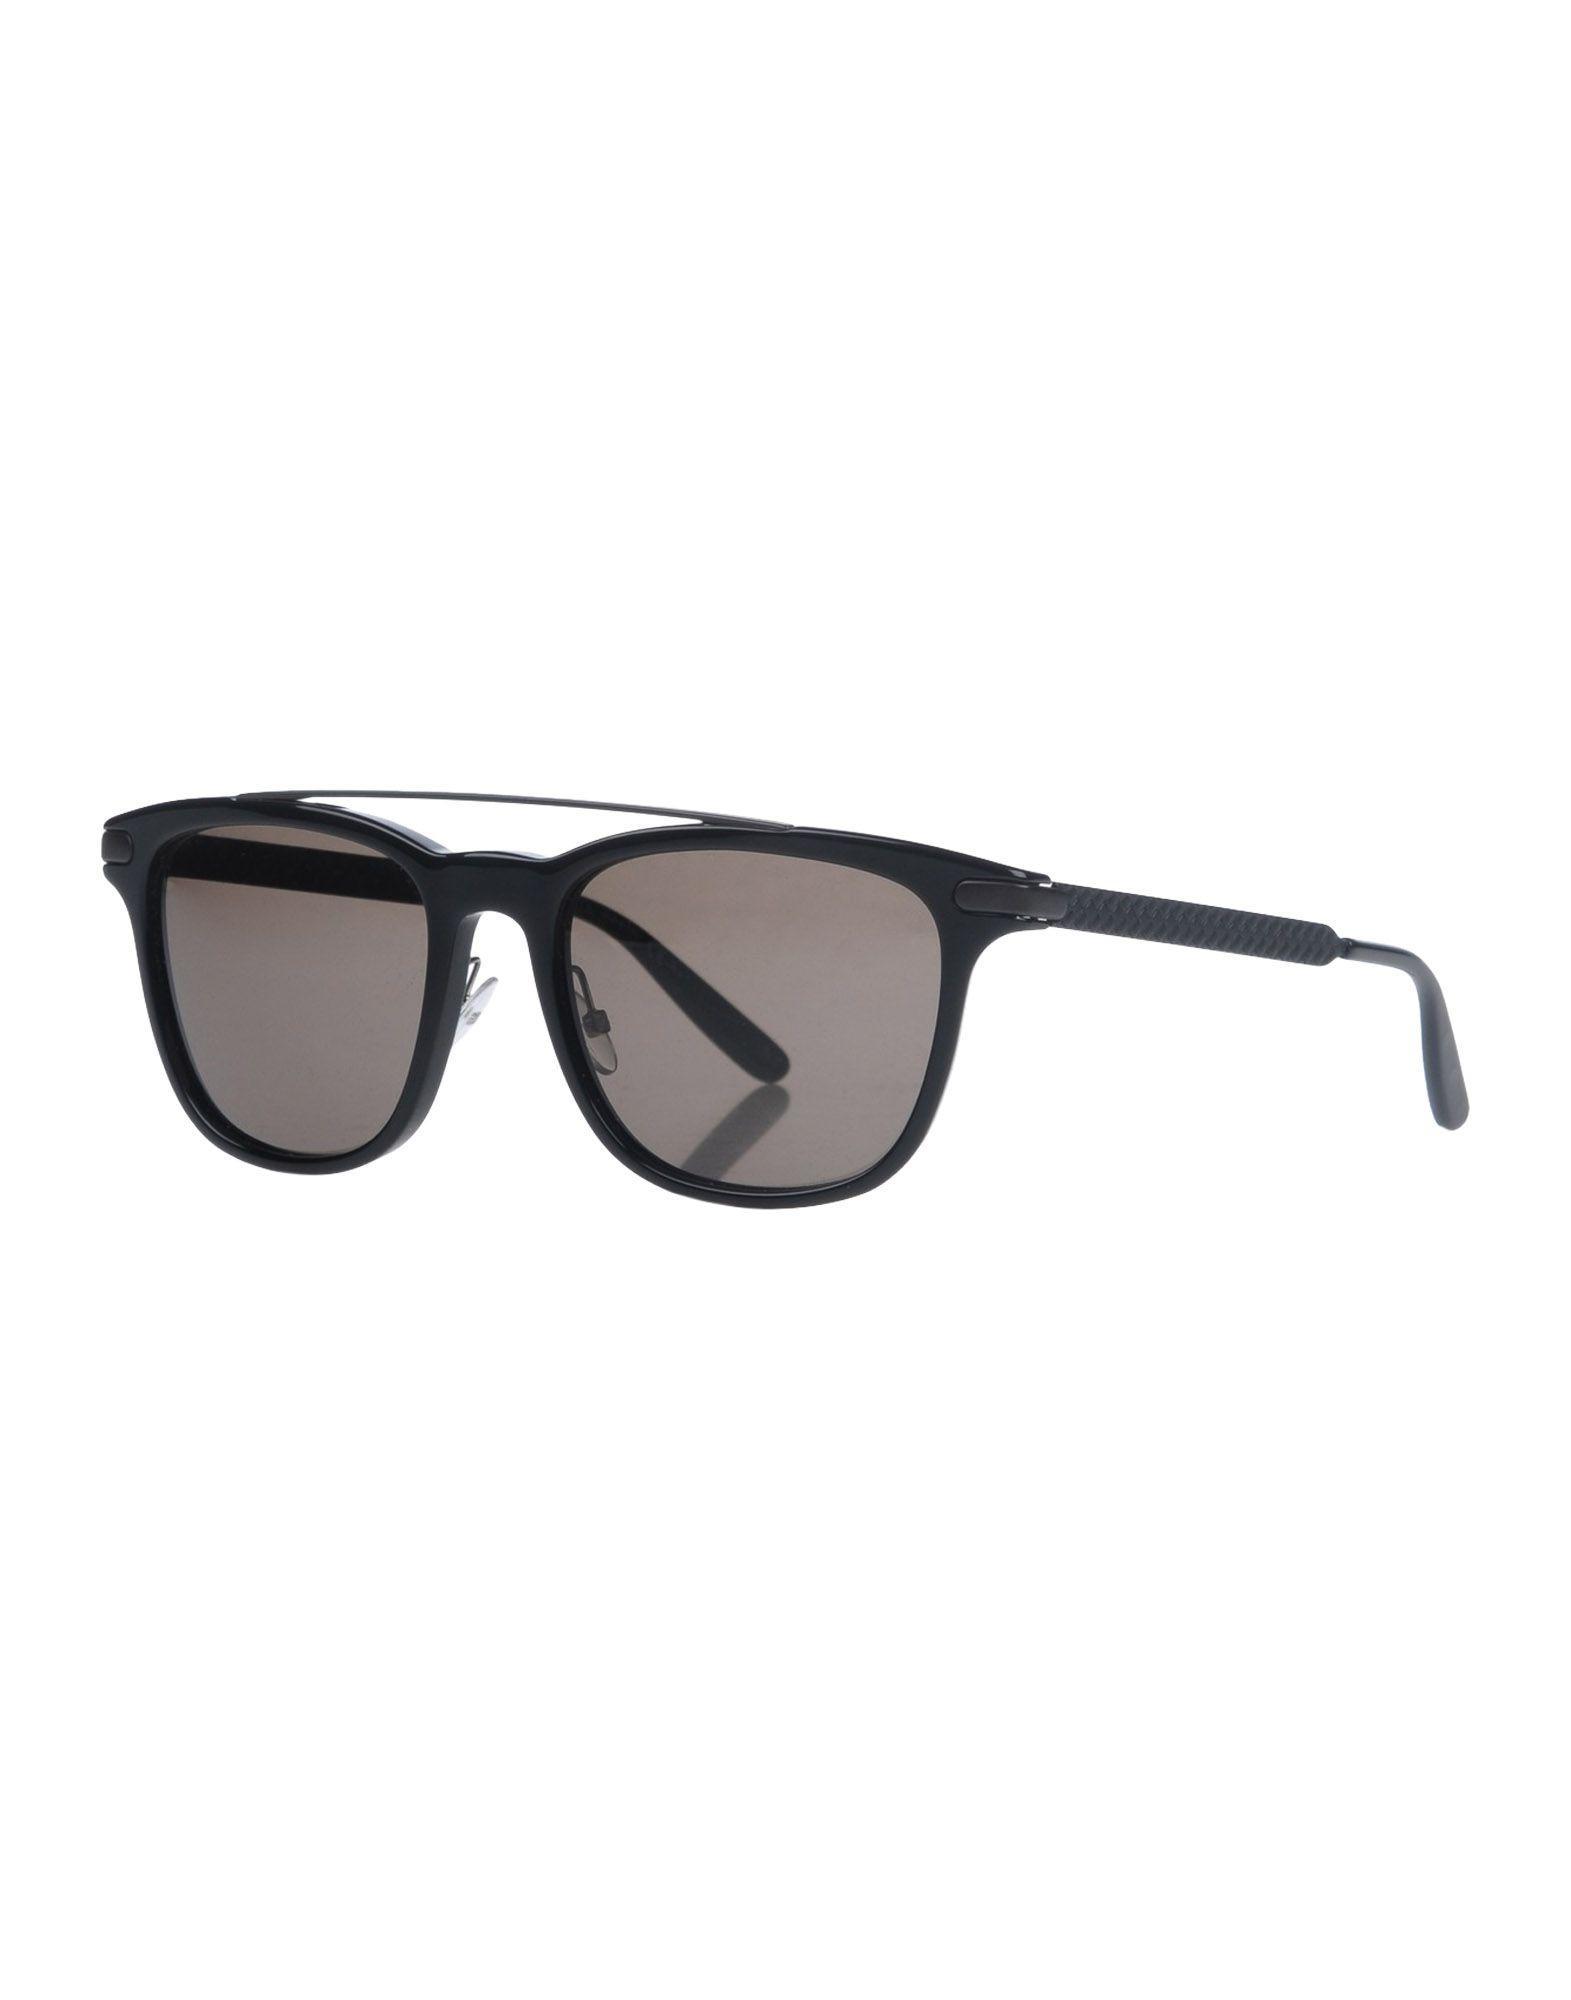 88f8c156a7cc Bottega Veneta Mens Sunglasses Sale